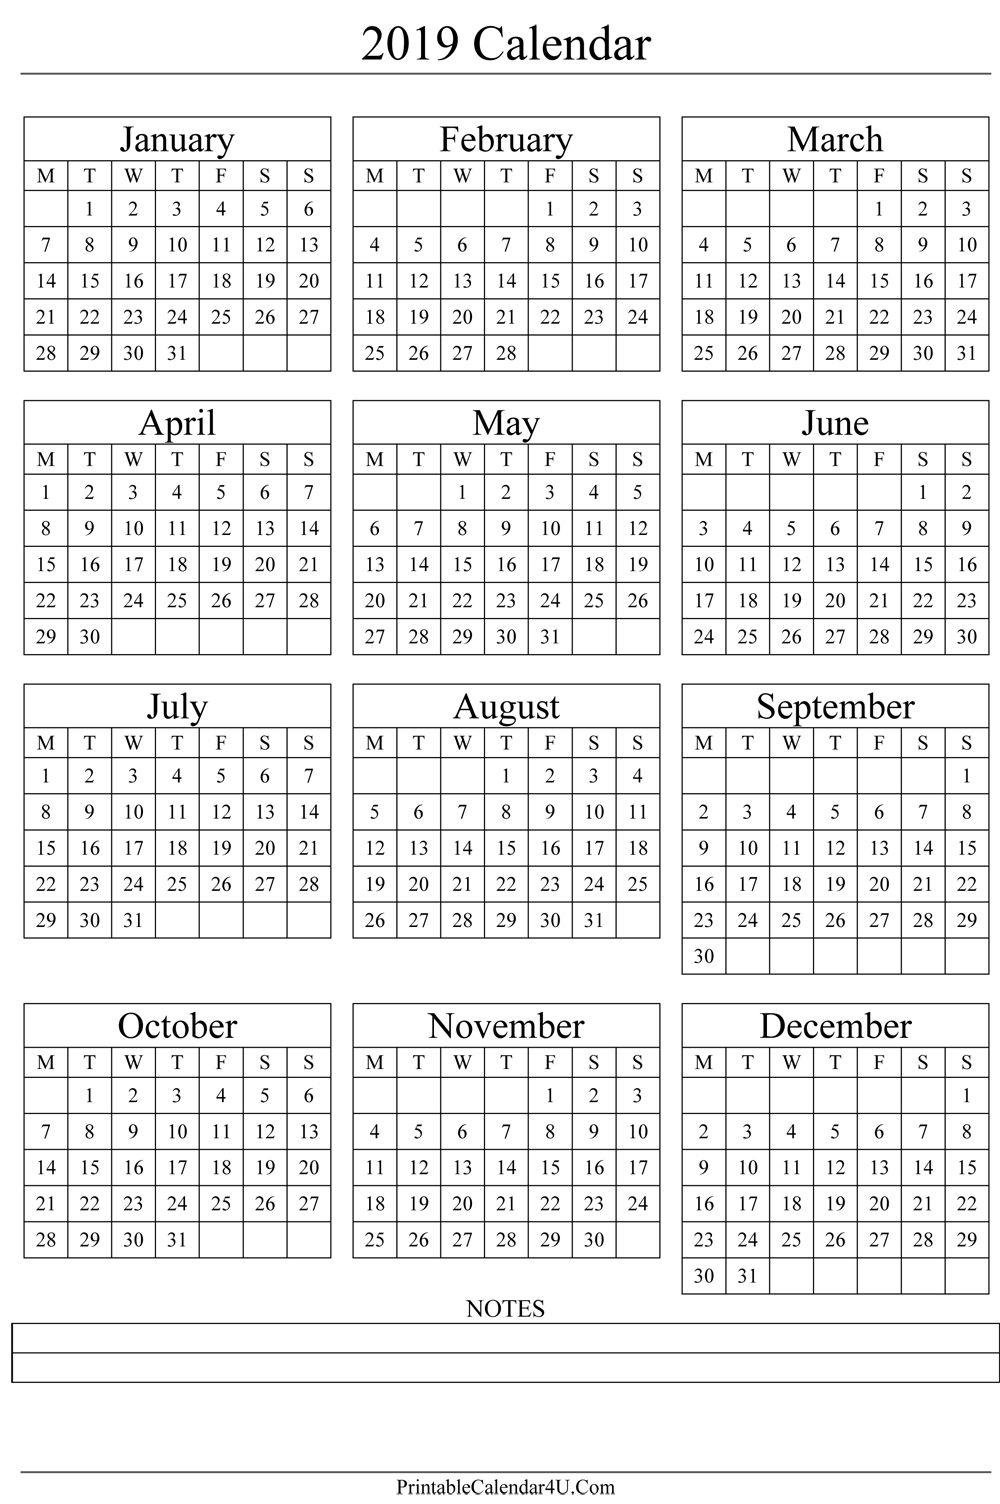 Year Calendar 1 Page Ten Free Printable Calendar 2019 2020 2